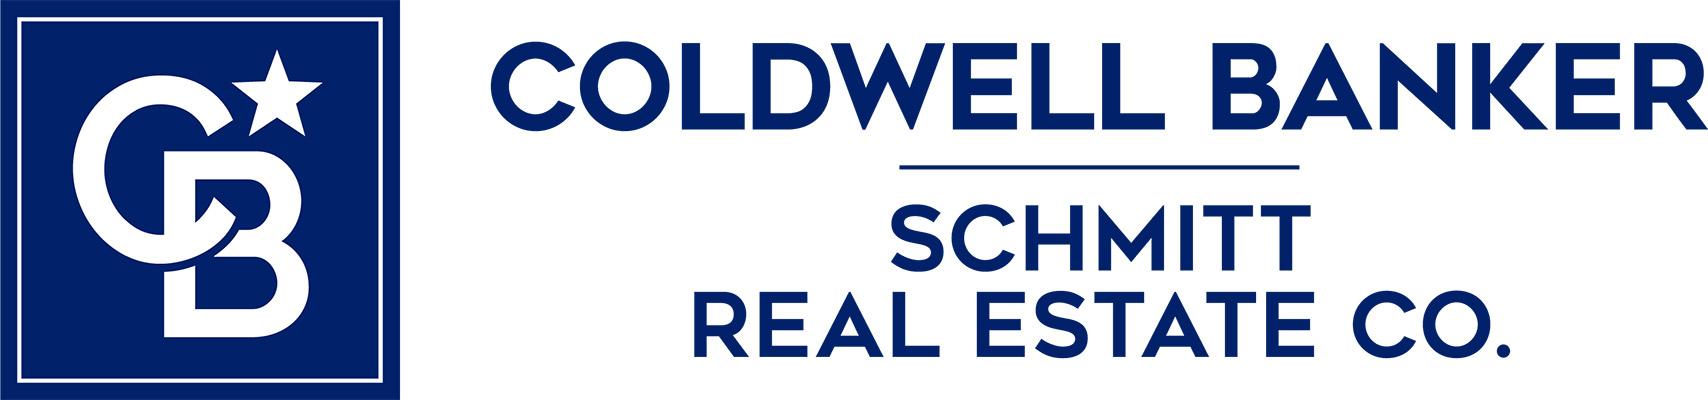 Jessica Abarca - Coldwell Banker Logo